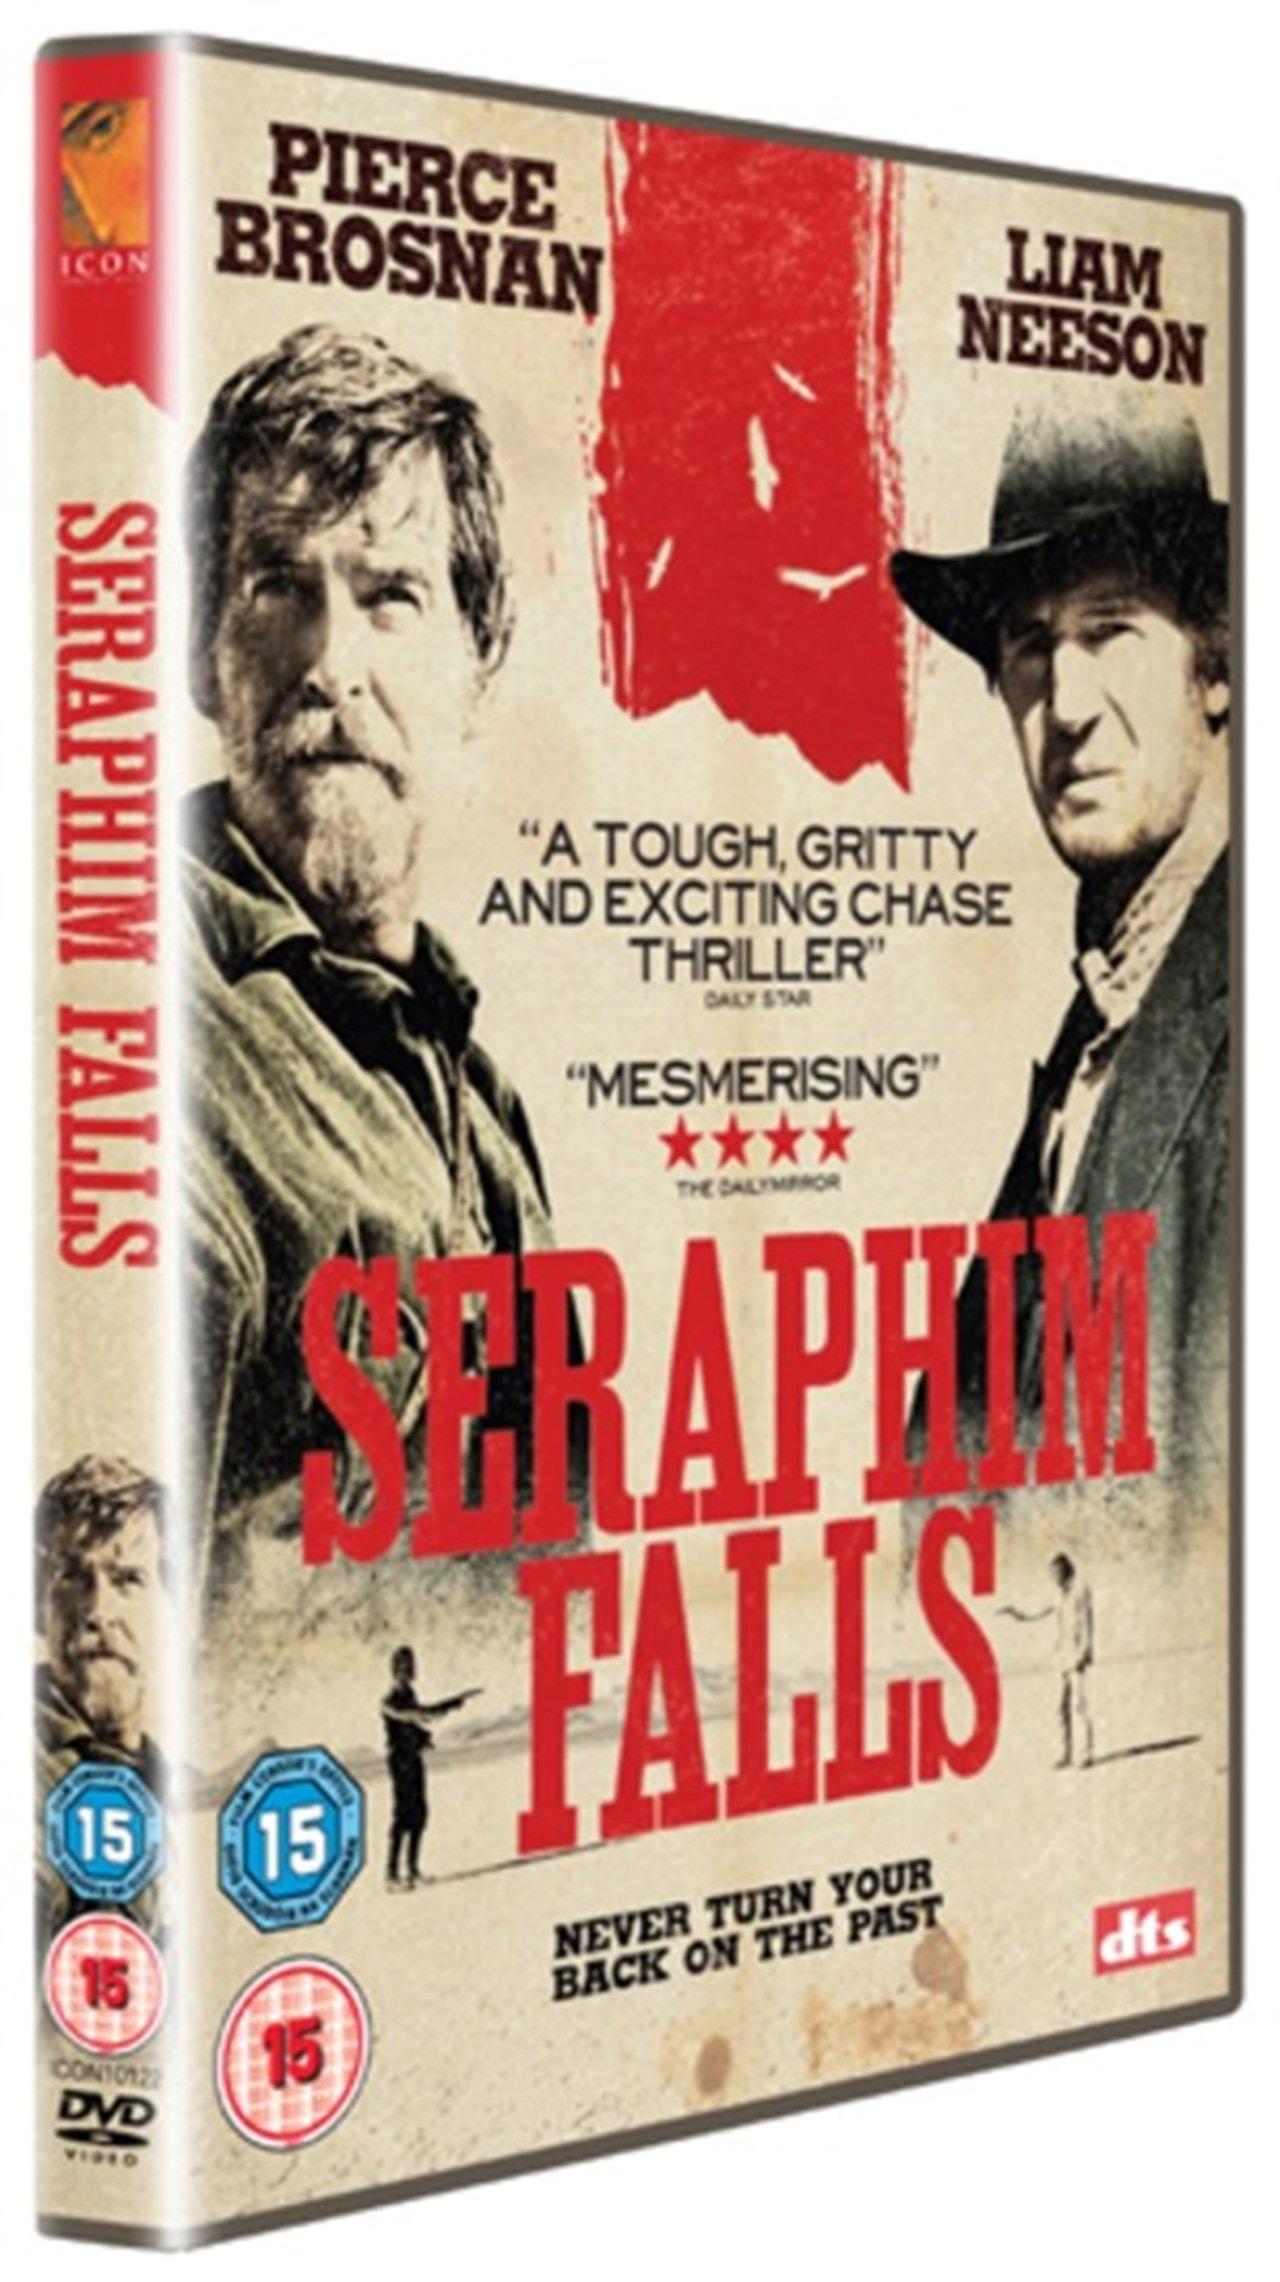 Seraphim Falls - 1